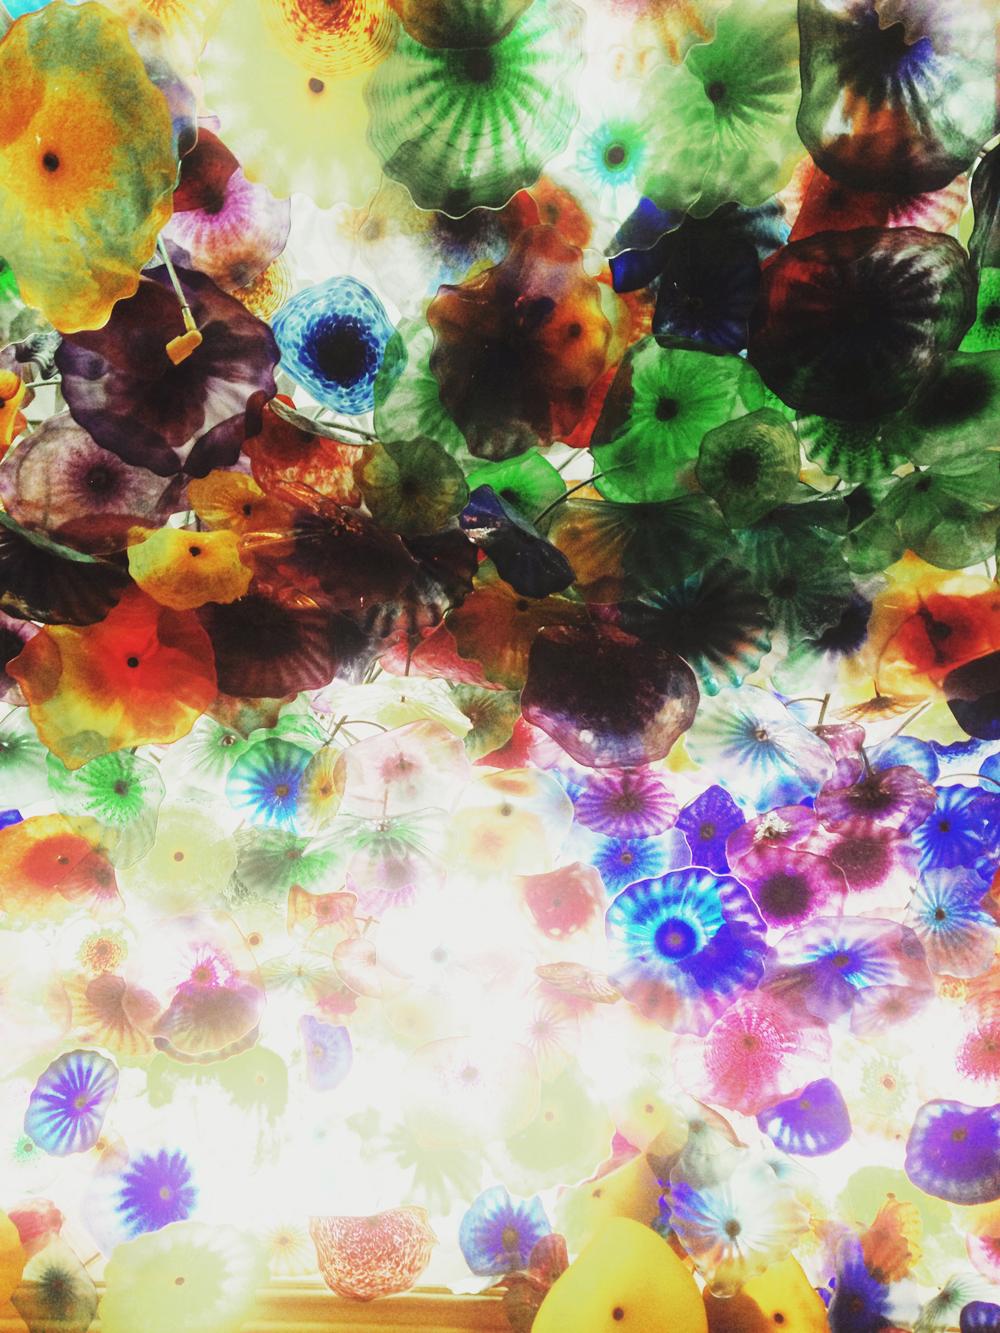 bellagio hotel colored glass ceiling.JPG